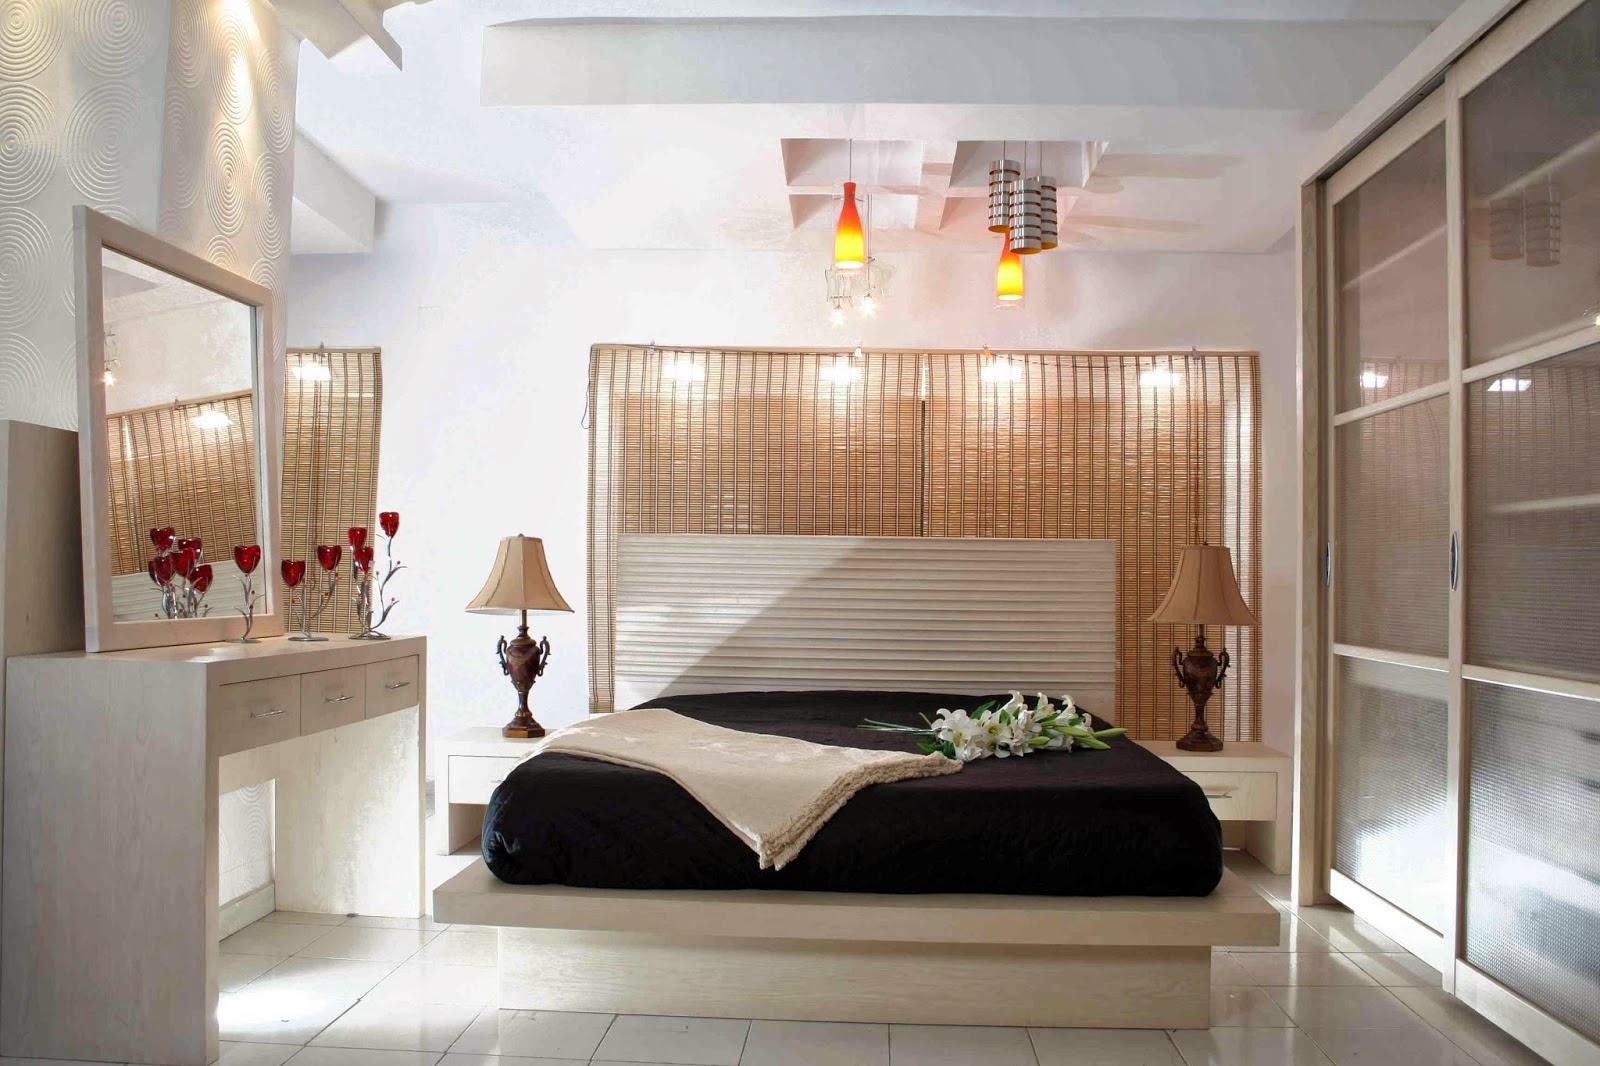 بالصور ديكورات غرف نوم 2019 , ديكور رائع لغرفة اروع 388 13